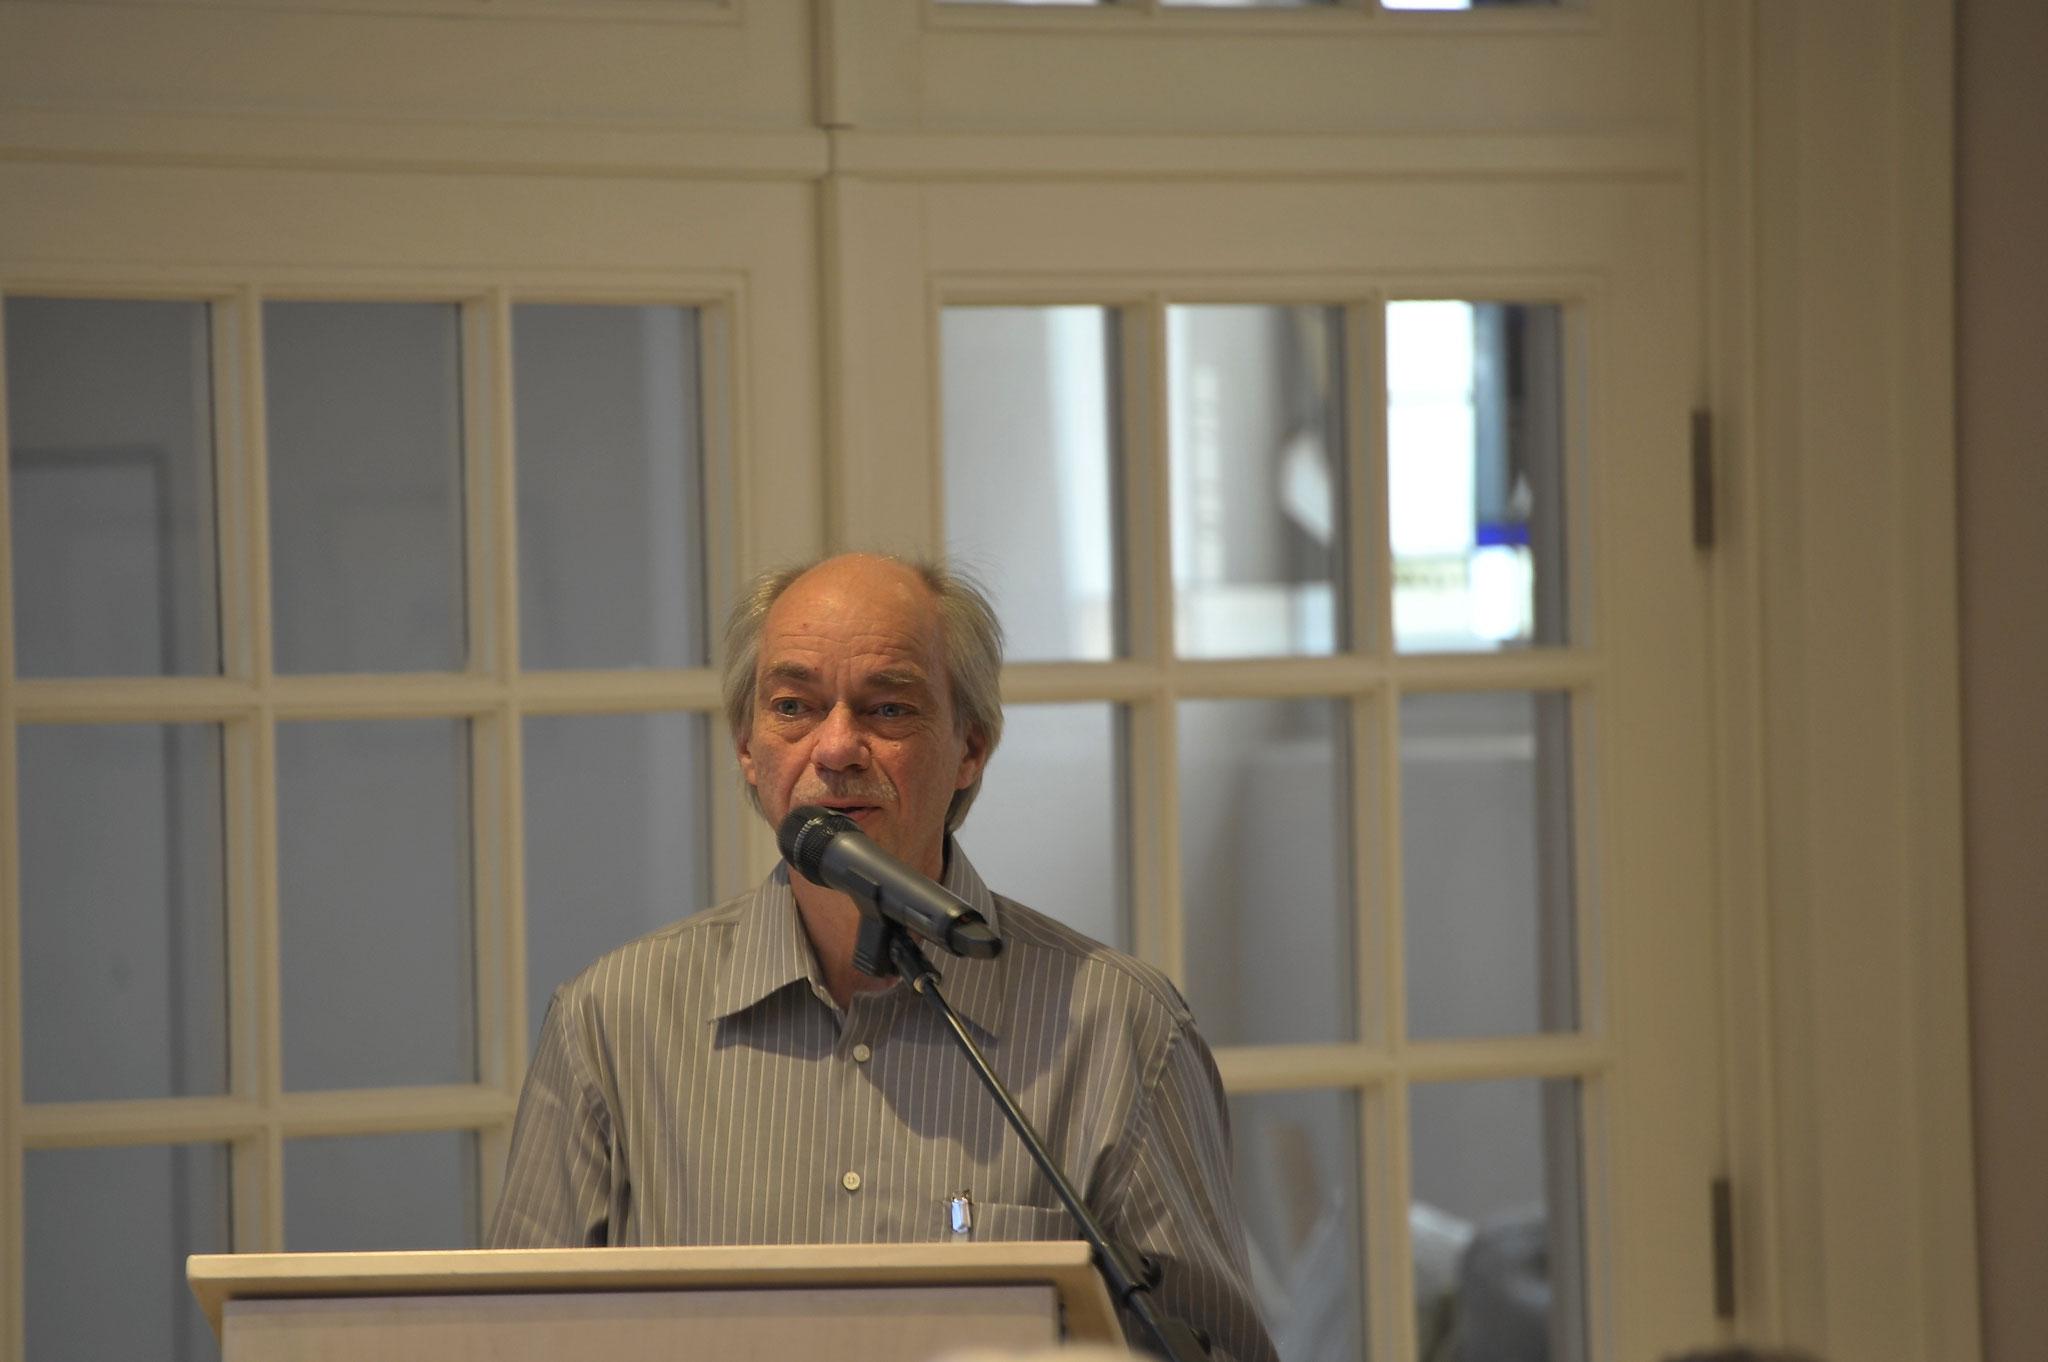 Laudator Jürgen Honsbrock, Haustechniker der Stiftung